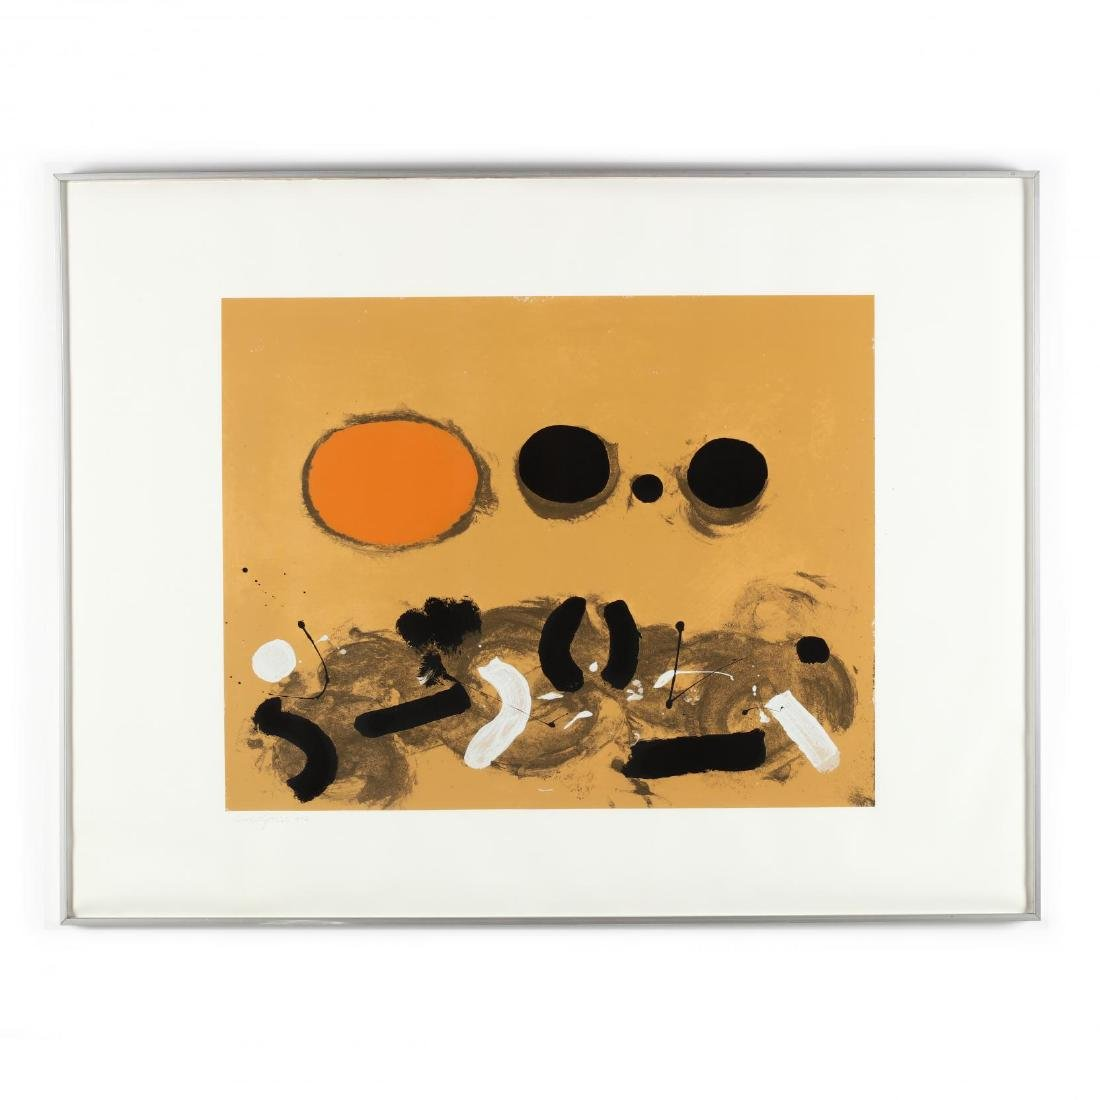 Adolph Gottlieb (American, 1903-1974),  Orange Oval